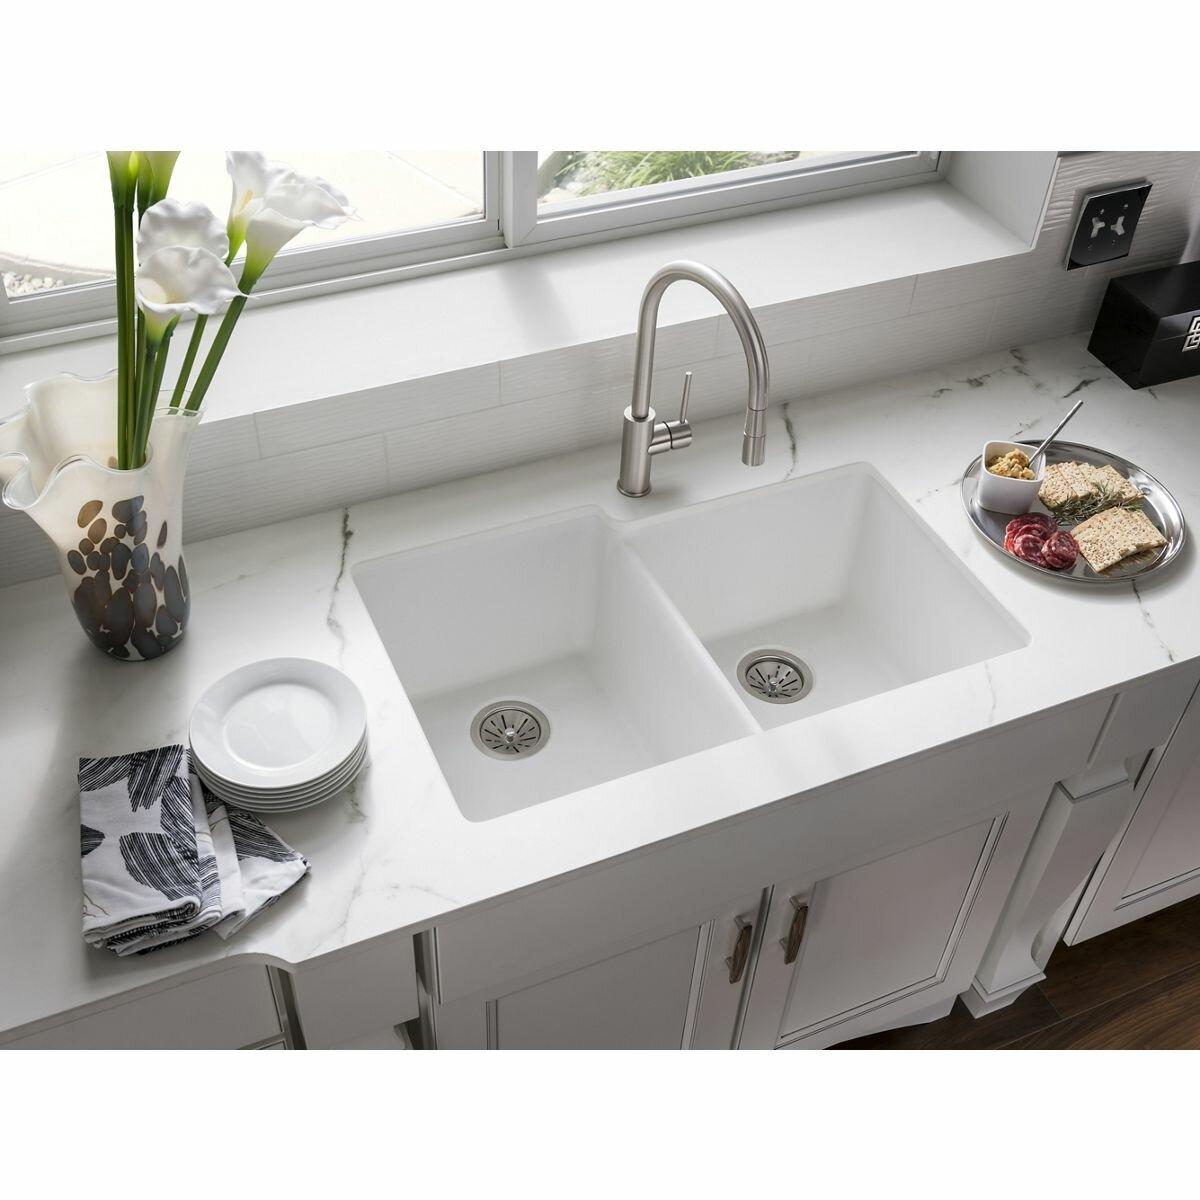 Elkay Quartz Classic 33 X 20 5 Double Bowl Undermount Kitchen Sink Wayfair